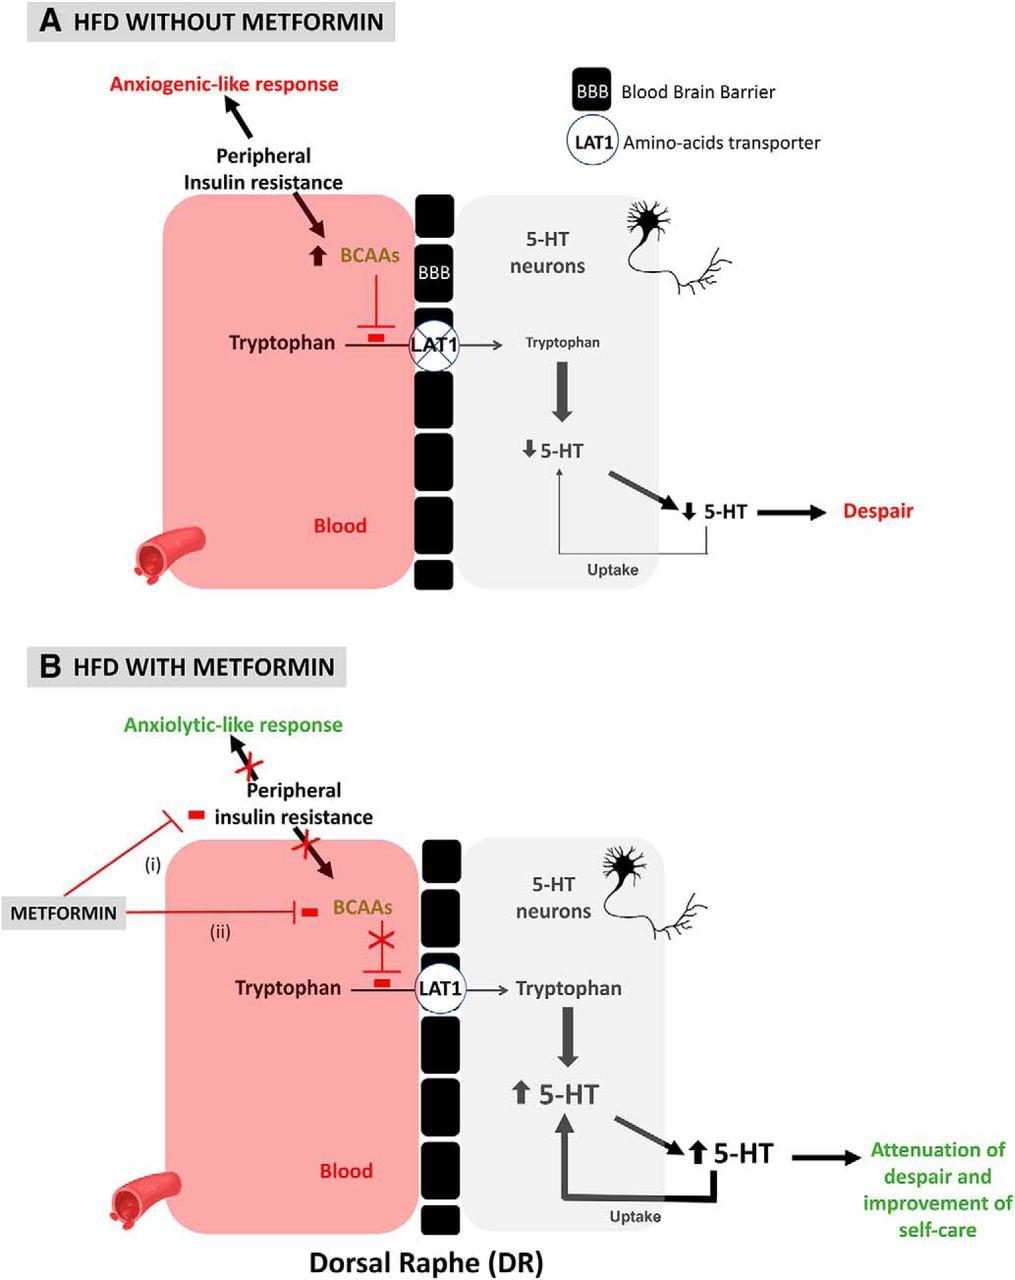 Metformin Promotes Anxiolytic and Antidepressant-Like